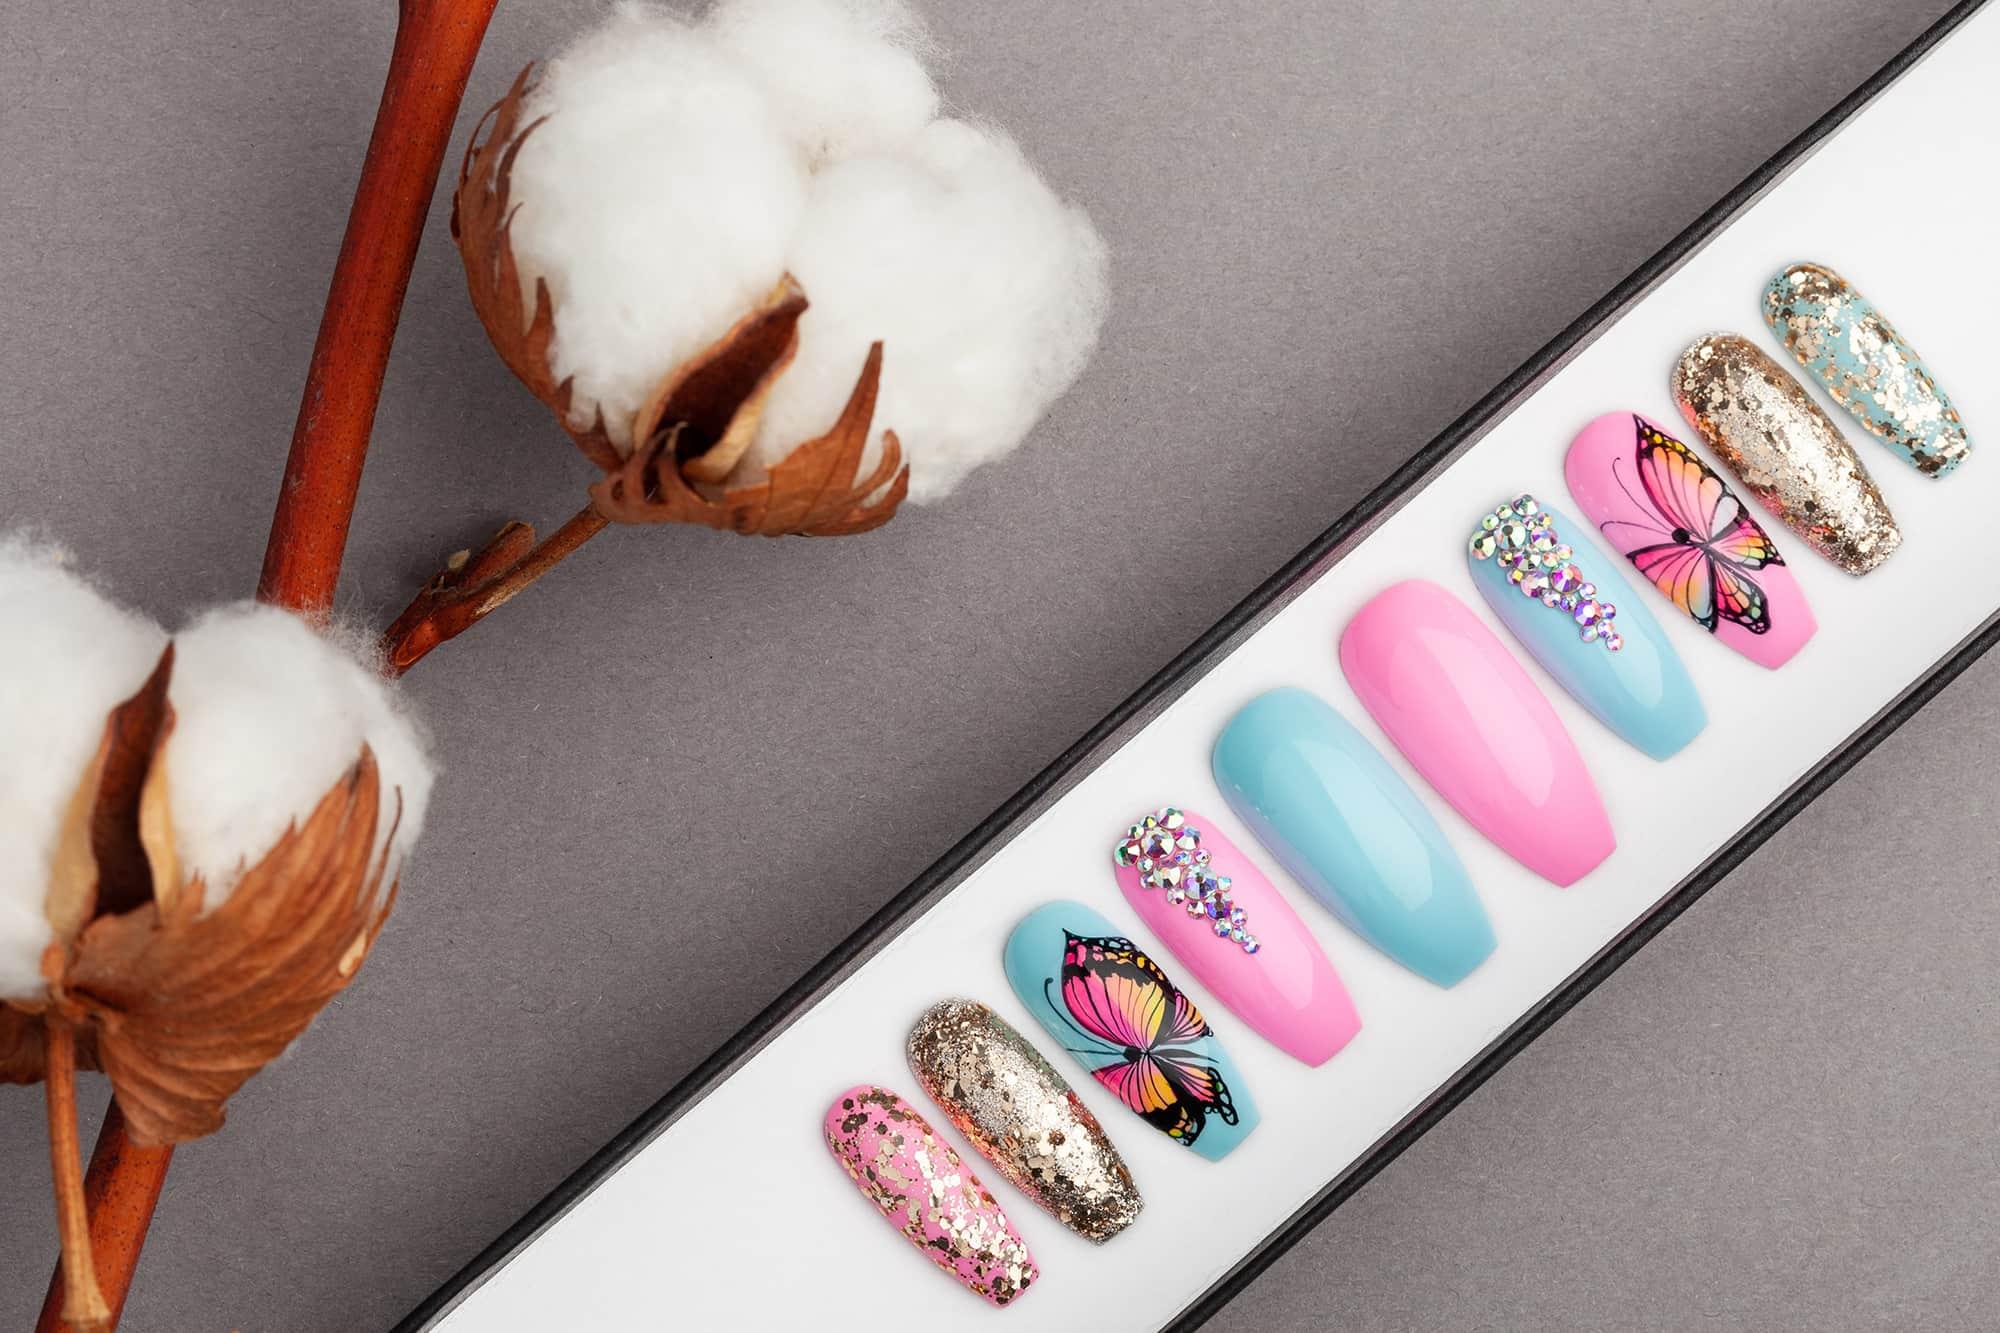 Summer Butterfly Press on Nails with Swarovski Crystals | Hand-painted | Nail Art | Fake Nails | False Nails | Glue On Nails